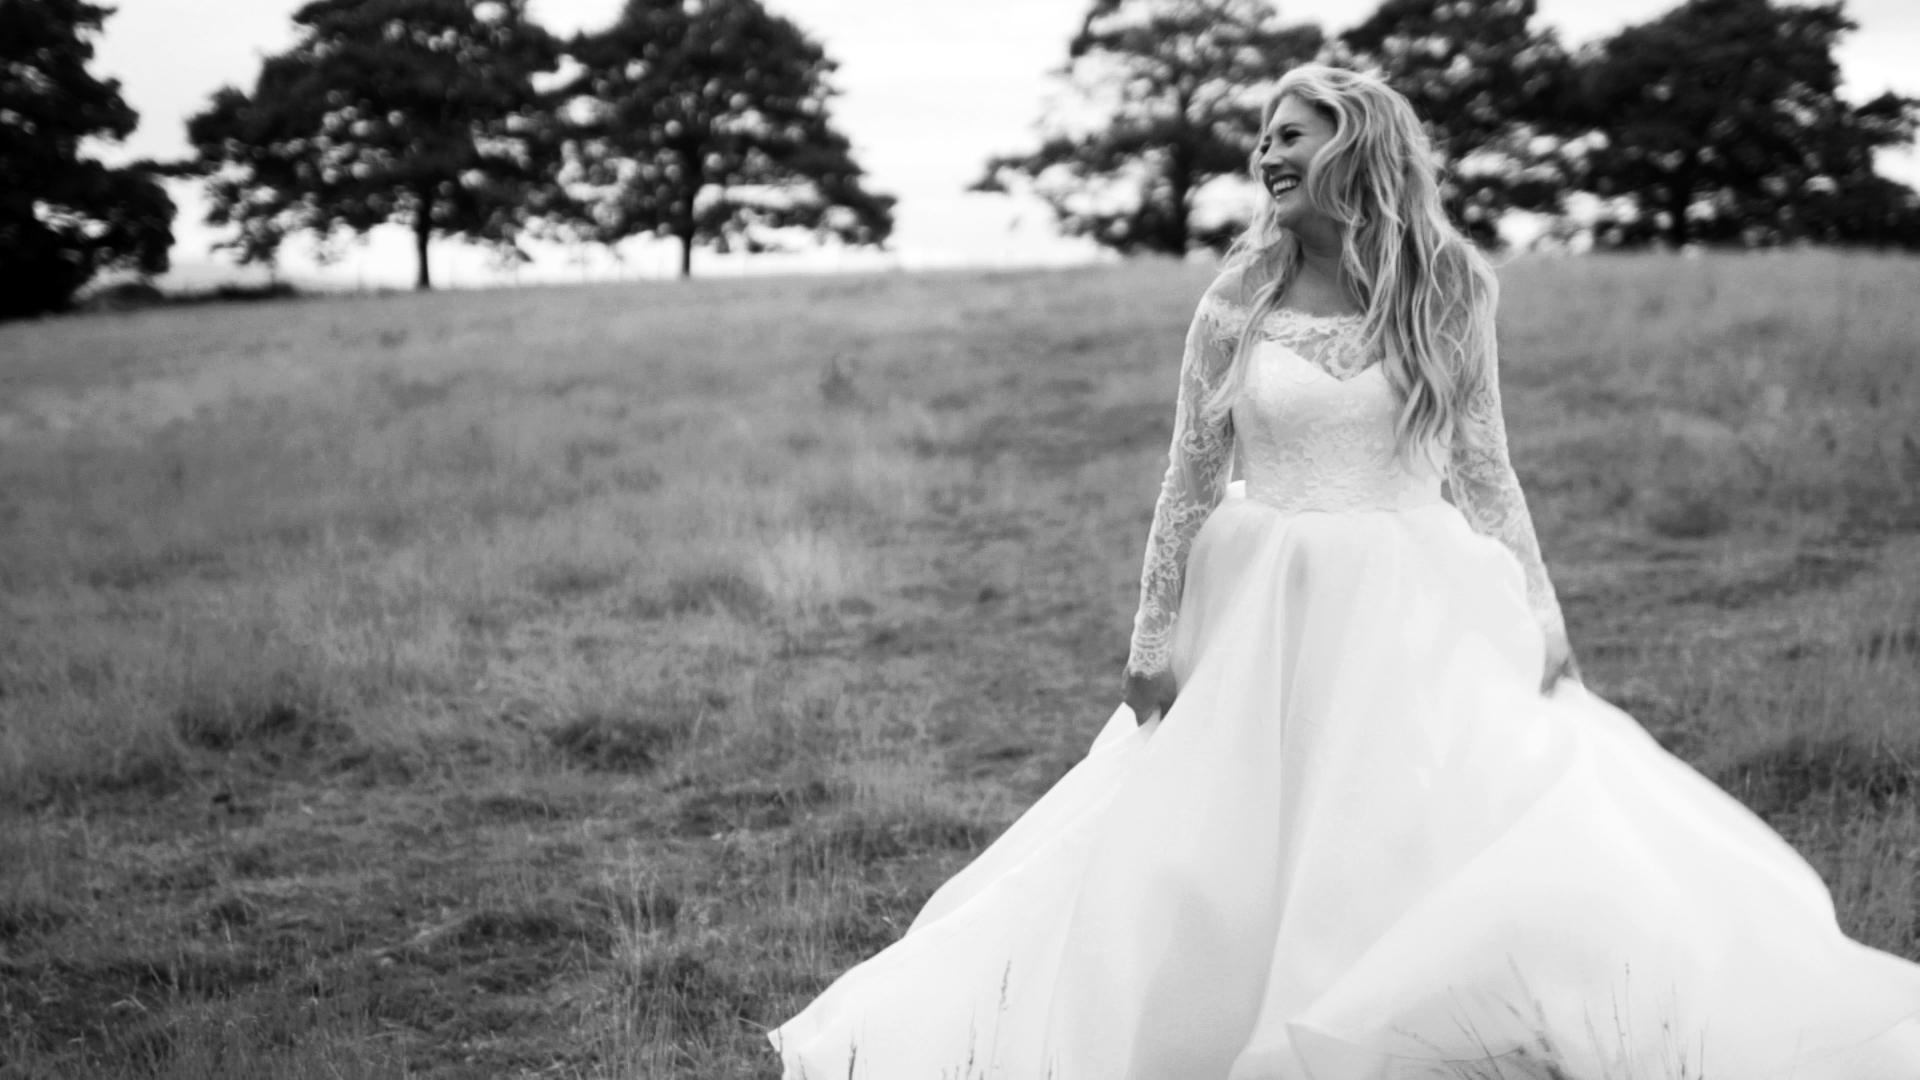 Kendra designer wedding dress by Caroline Castigliano